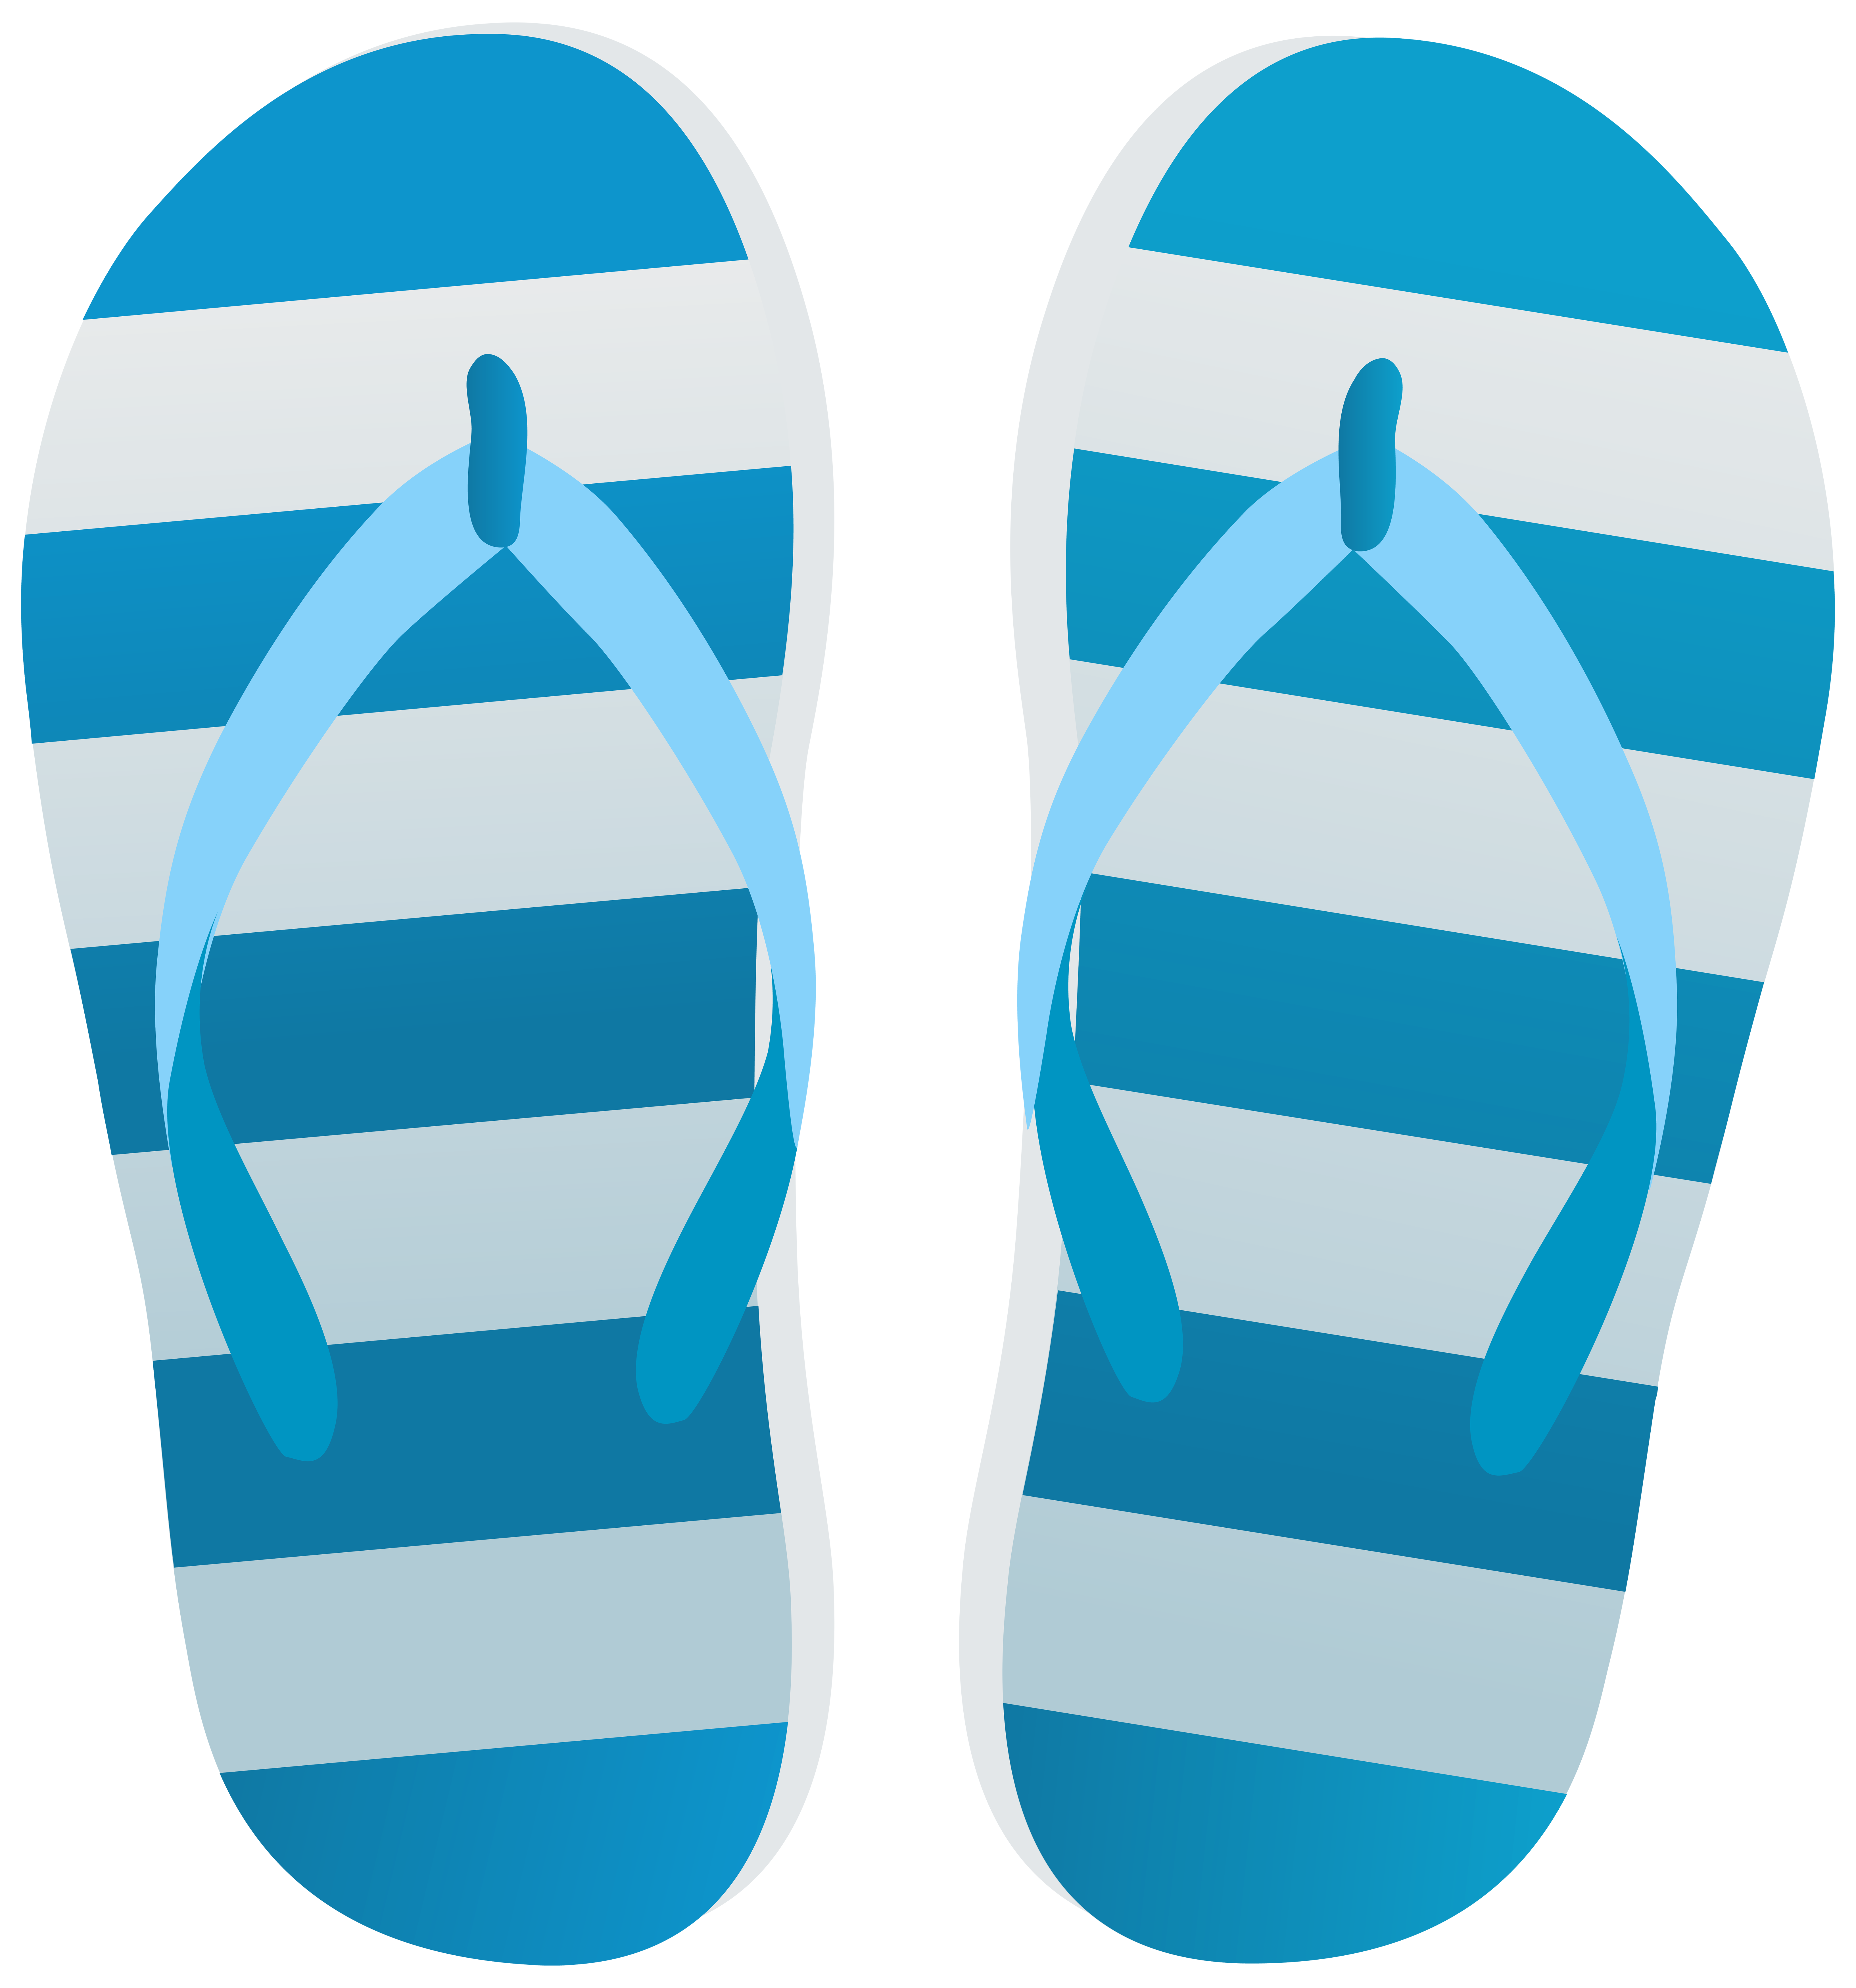 Blue flip flops transparent clip art image